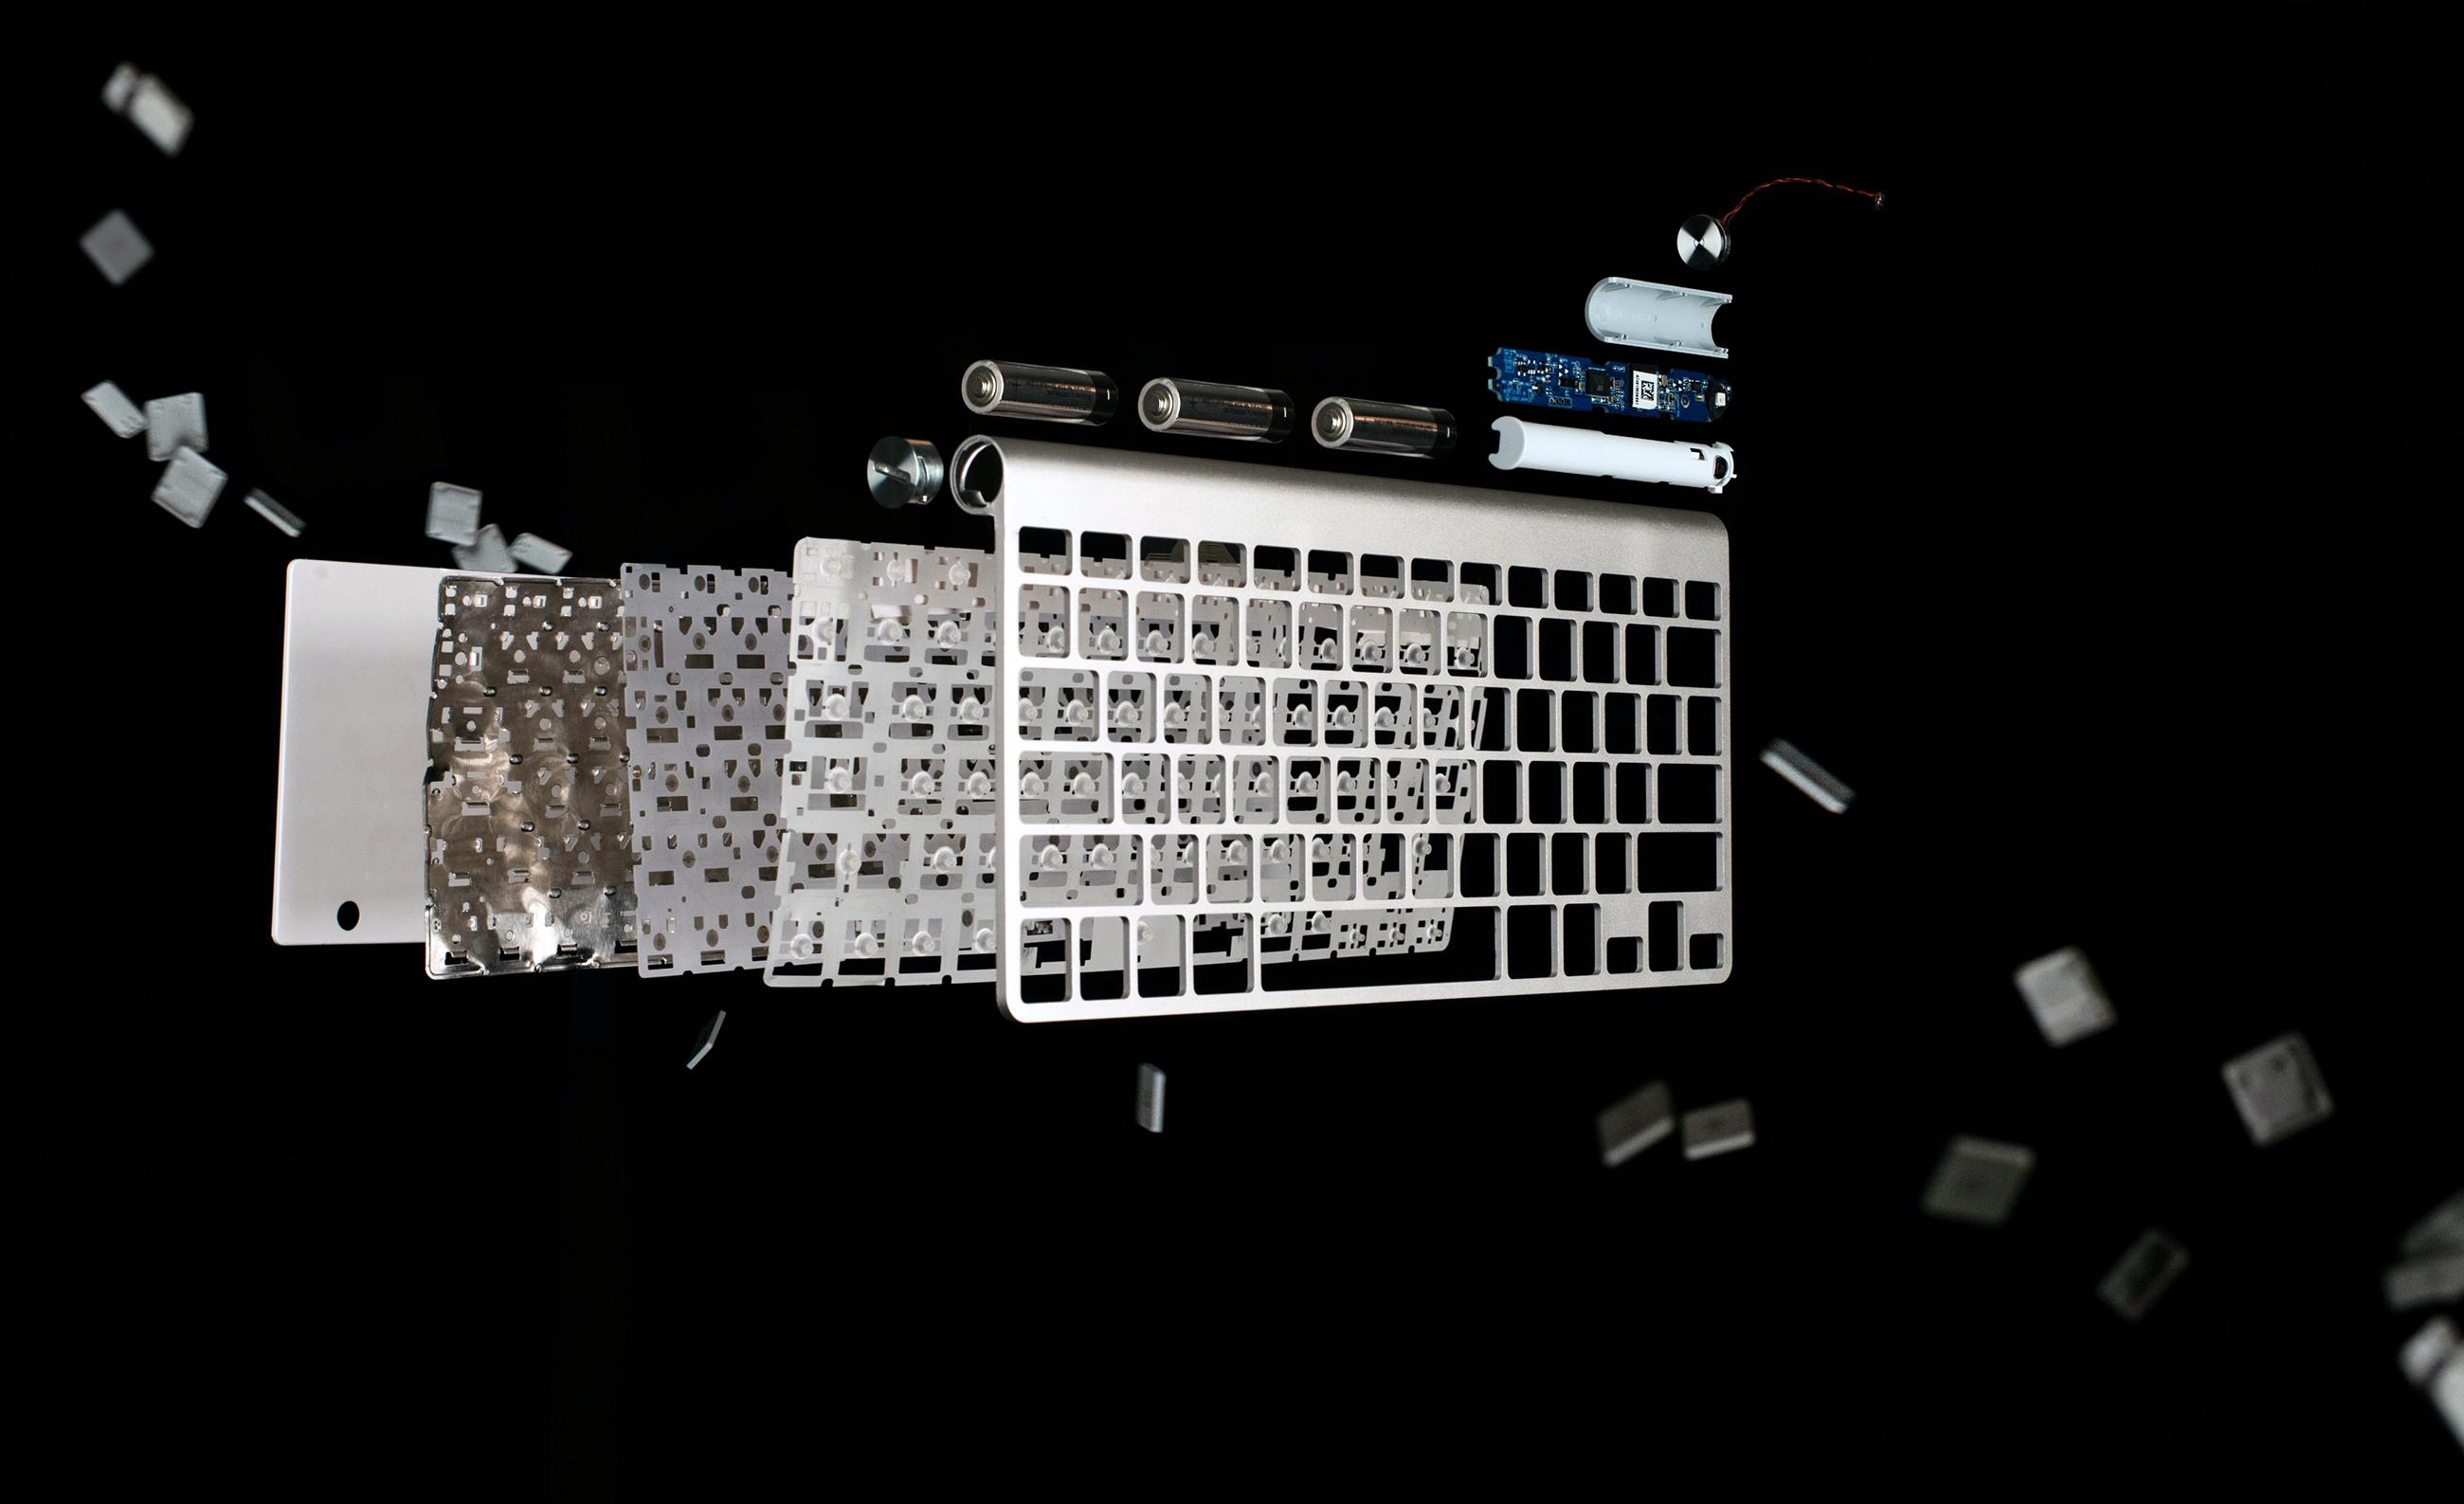 Visão explodida de um Apple Wireless Keyboard